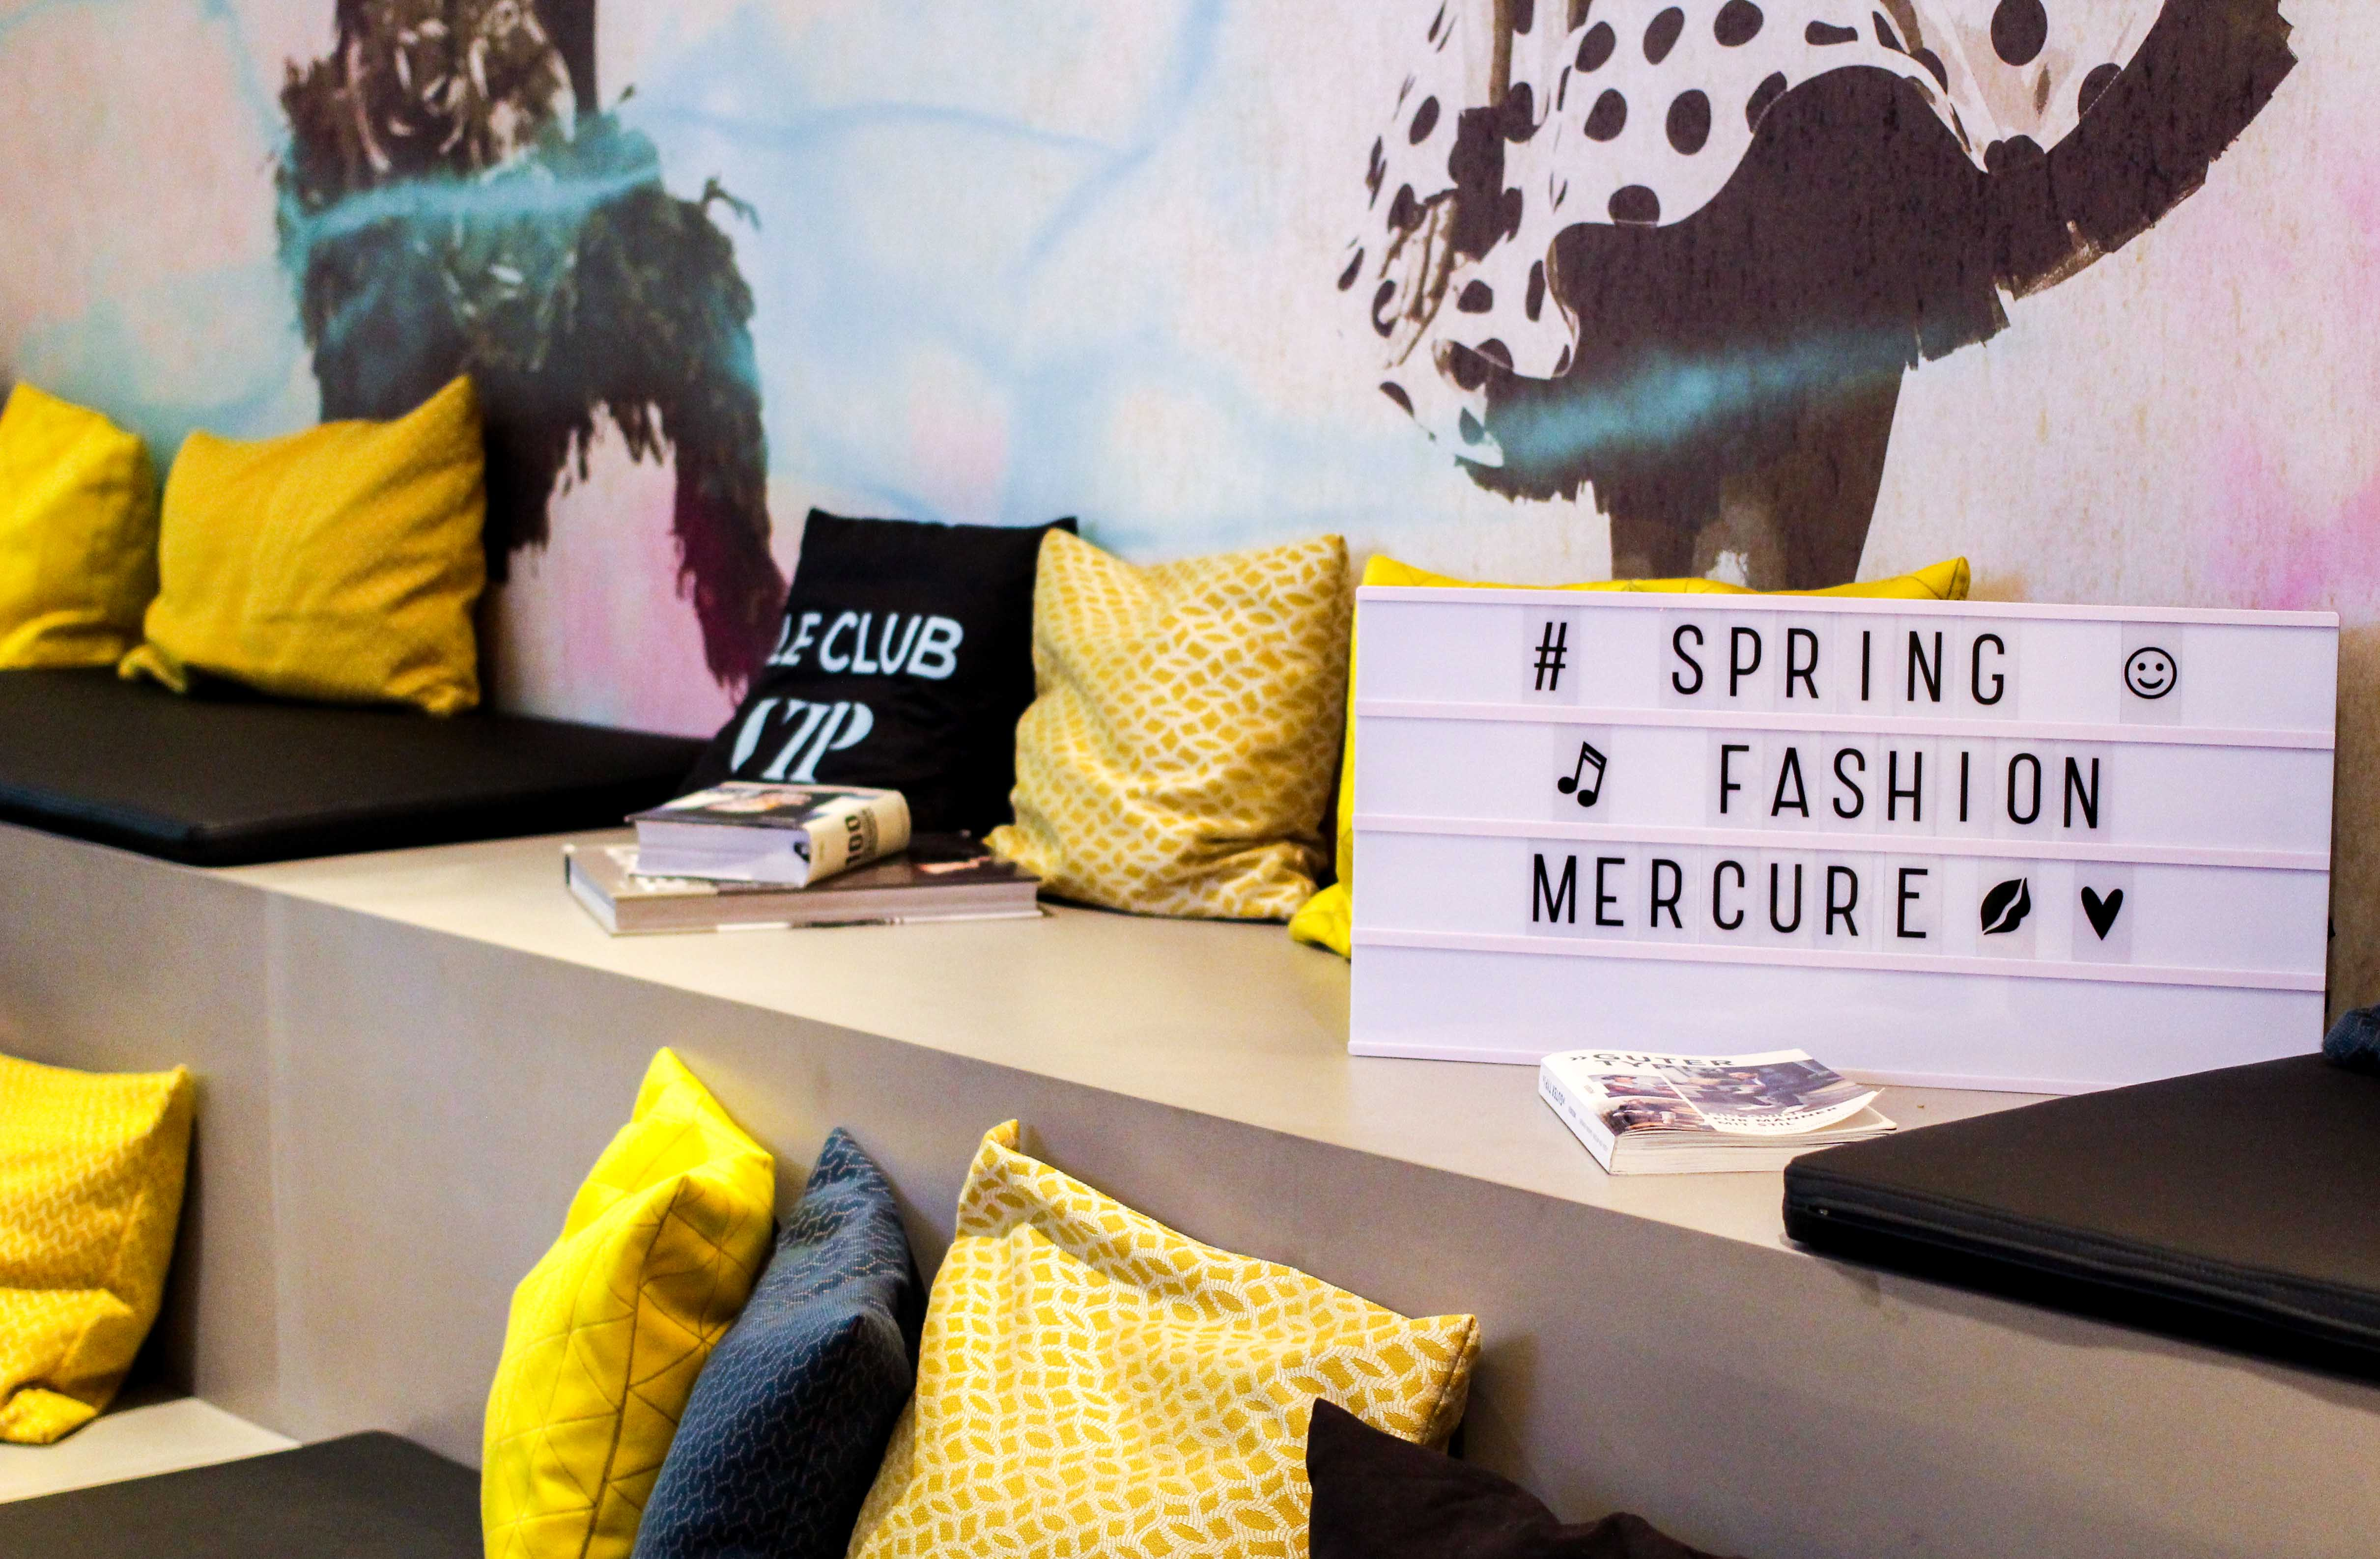 Hotel Fashion Week Mercure Hotel Berlin Wittenbergplatz Berlins Trend-Hotel Modeblogger Sitzecke Spring Fashion Mercure